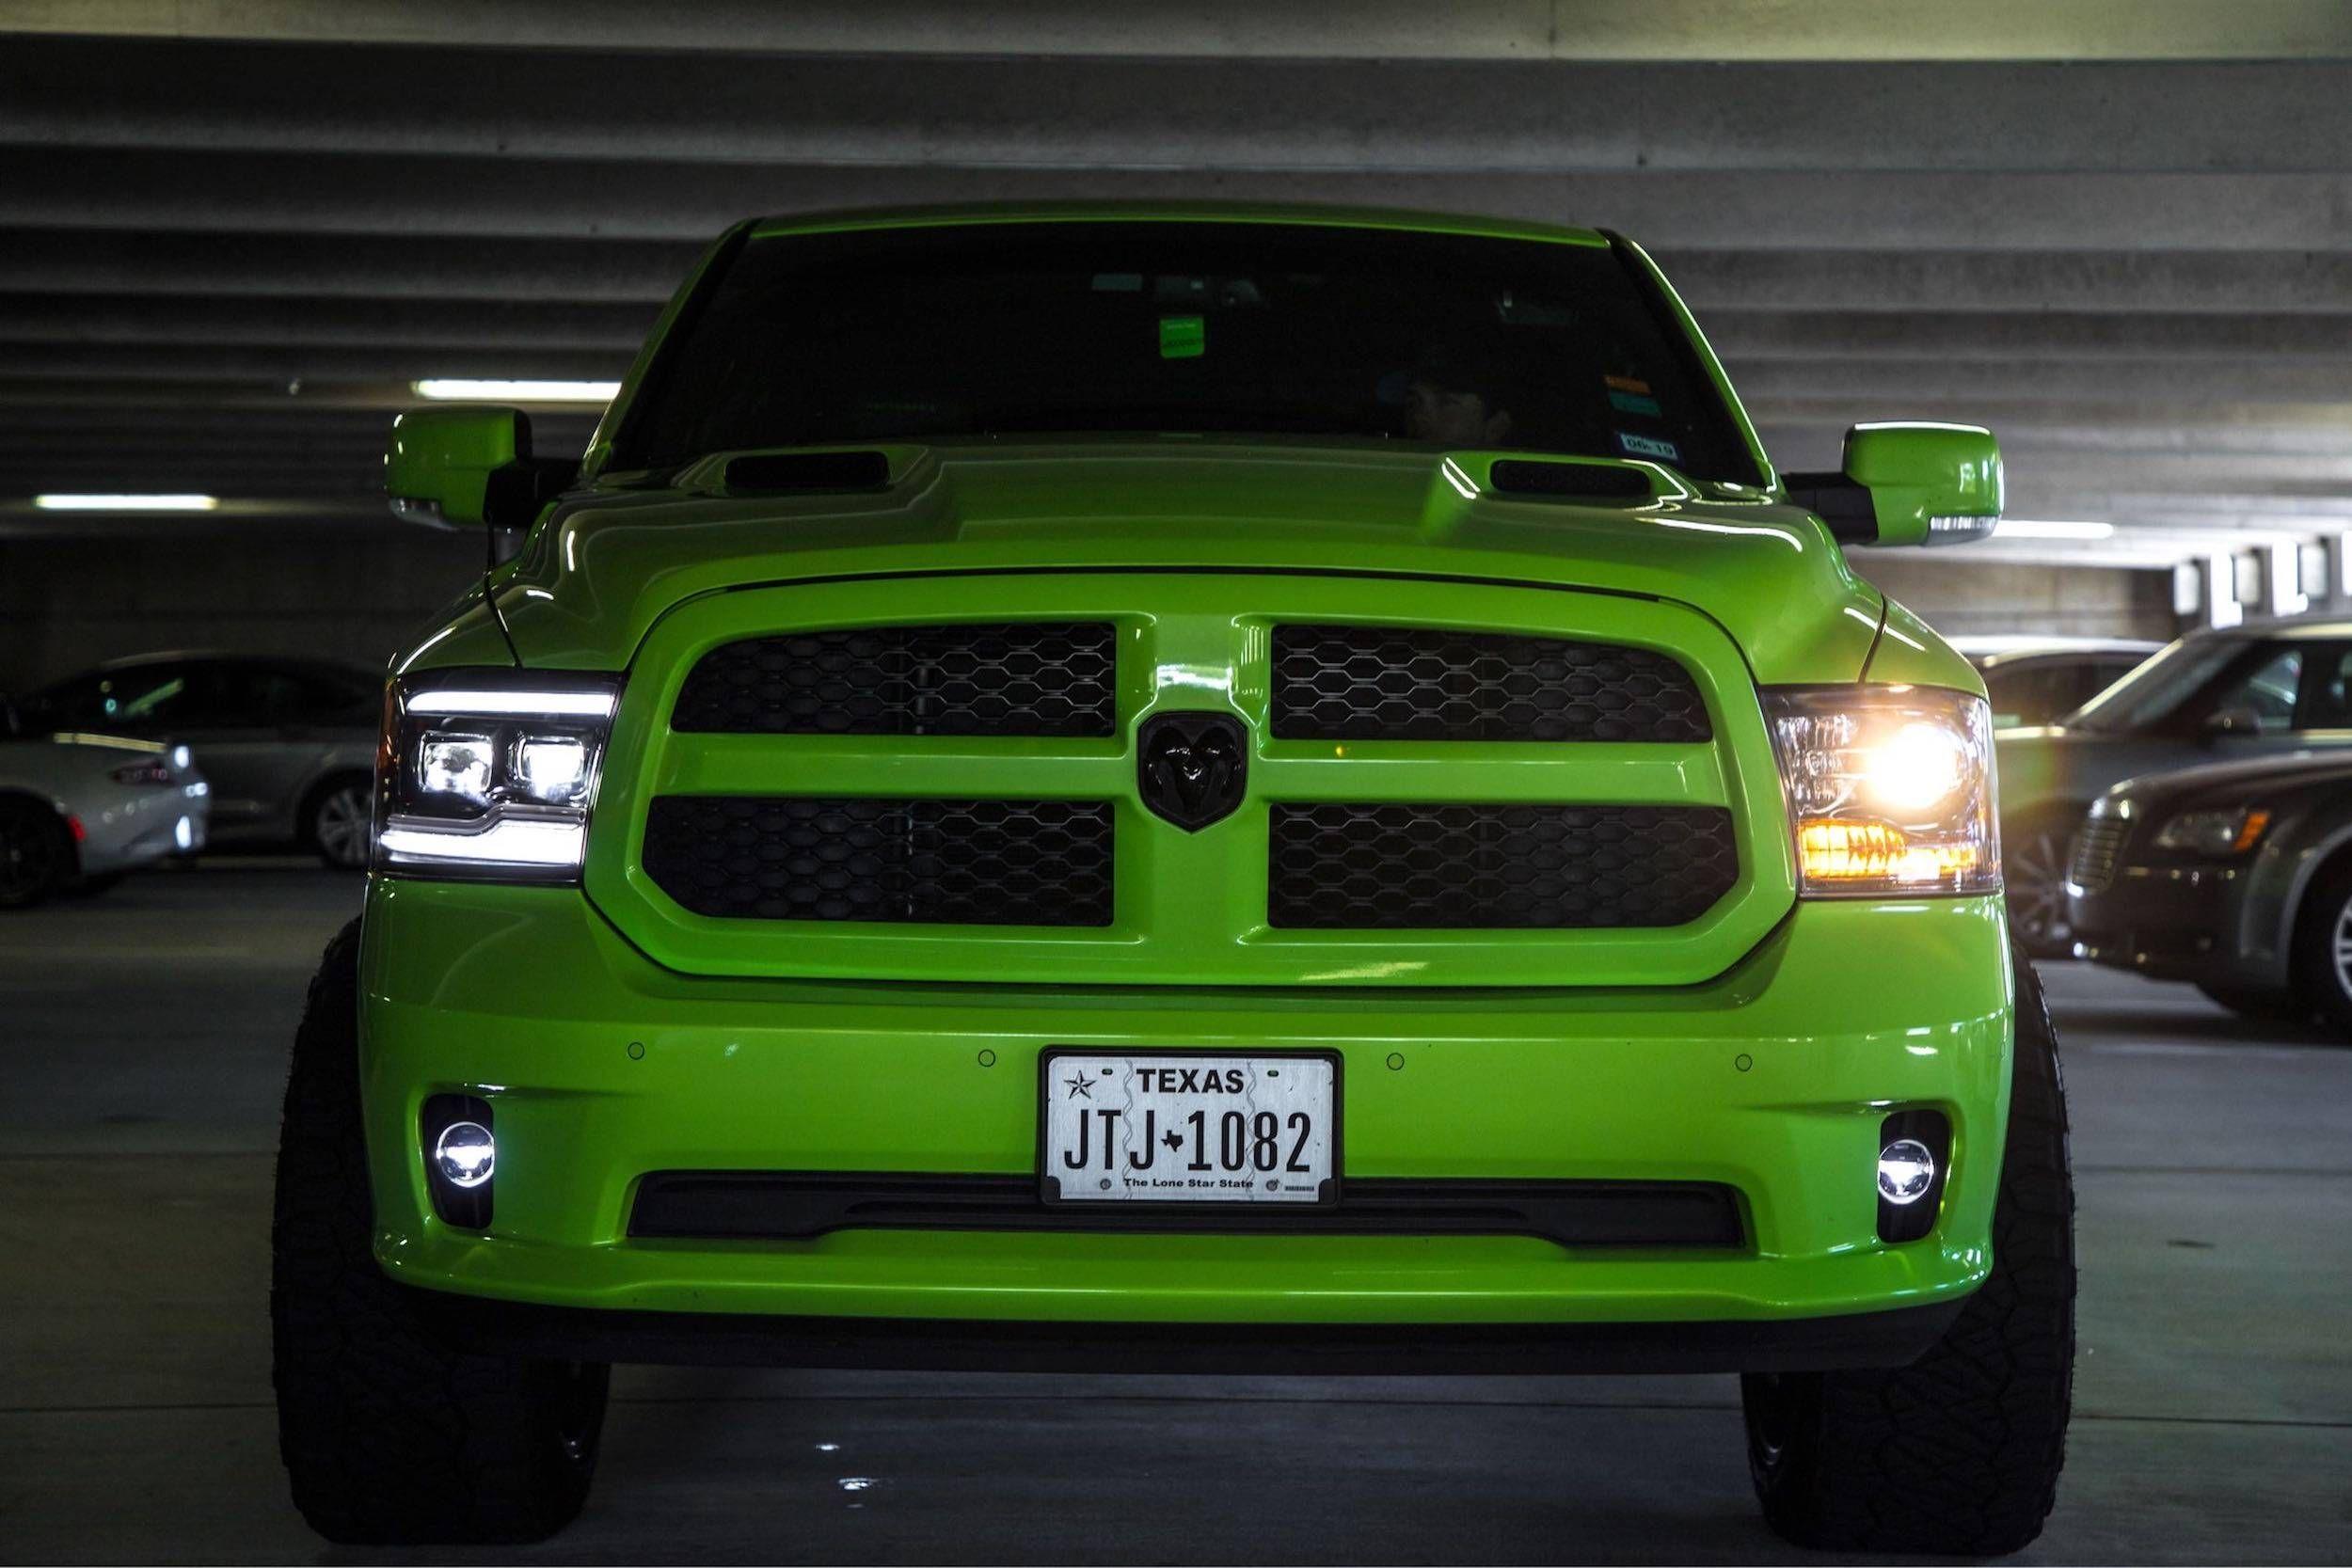 2009 2018 Dodge Ram Xb Led Projector Headlights Complete Led Housings From Morimoto Dodge Ram Dodge Ram Accessories Dodge